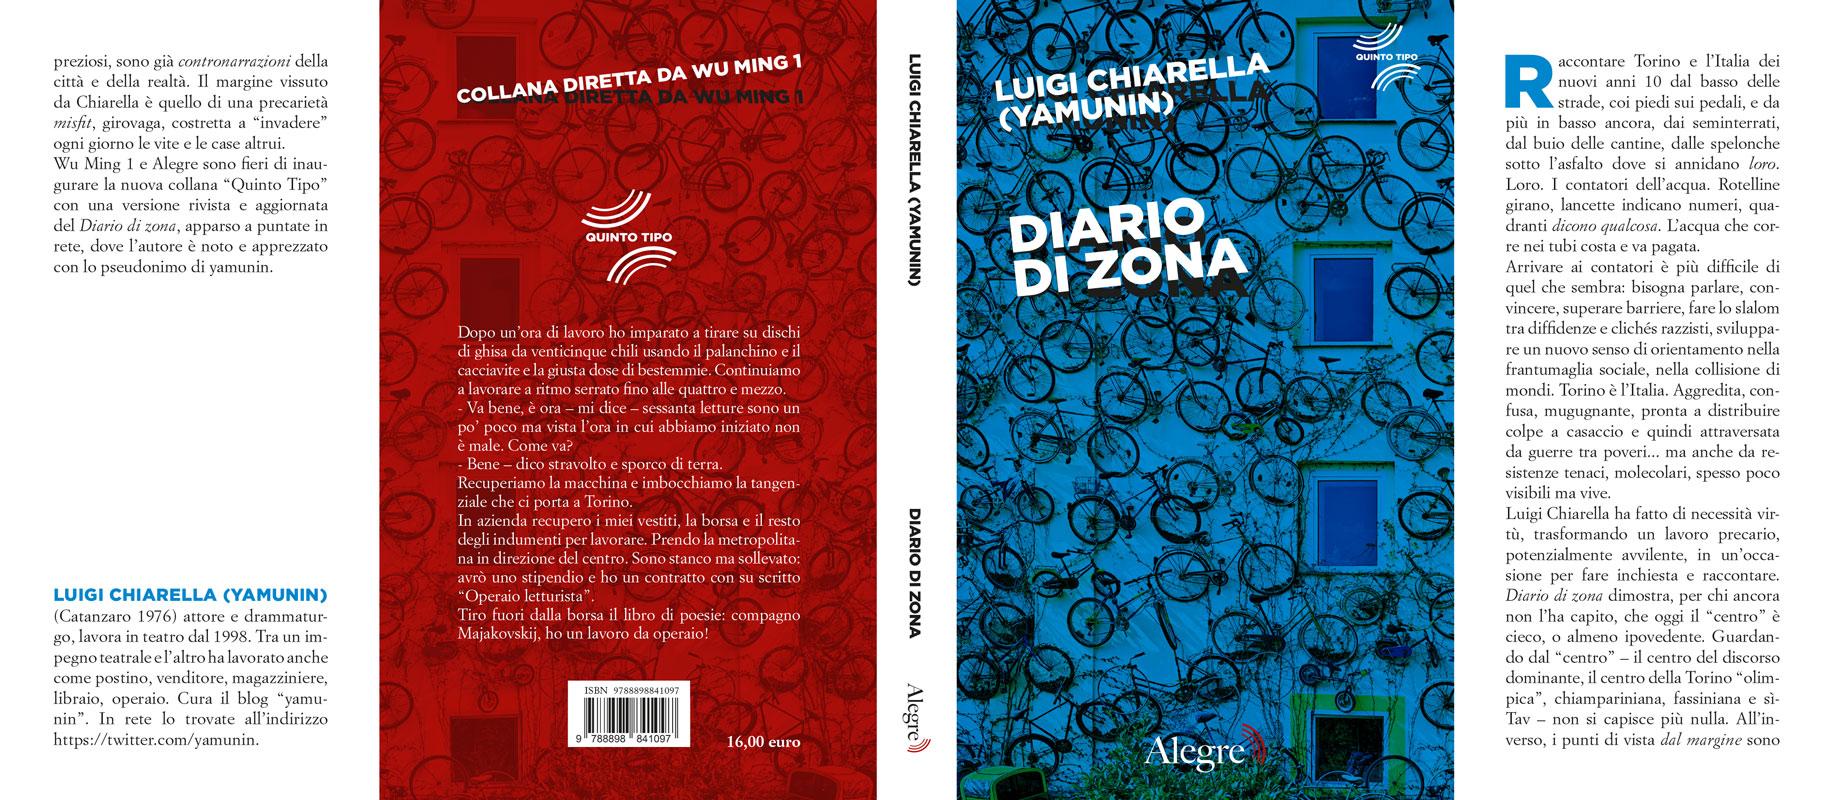 Luigi chiarella (Yamunin), Diario di zona, stesa